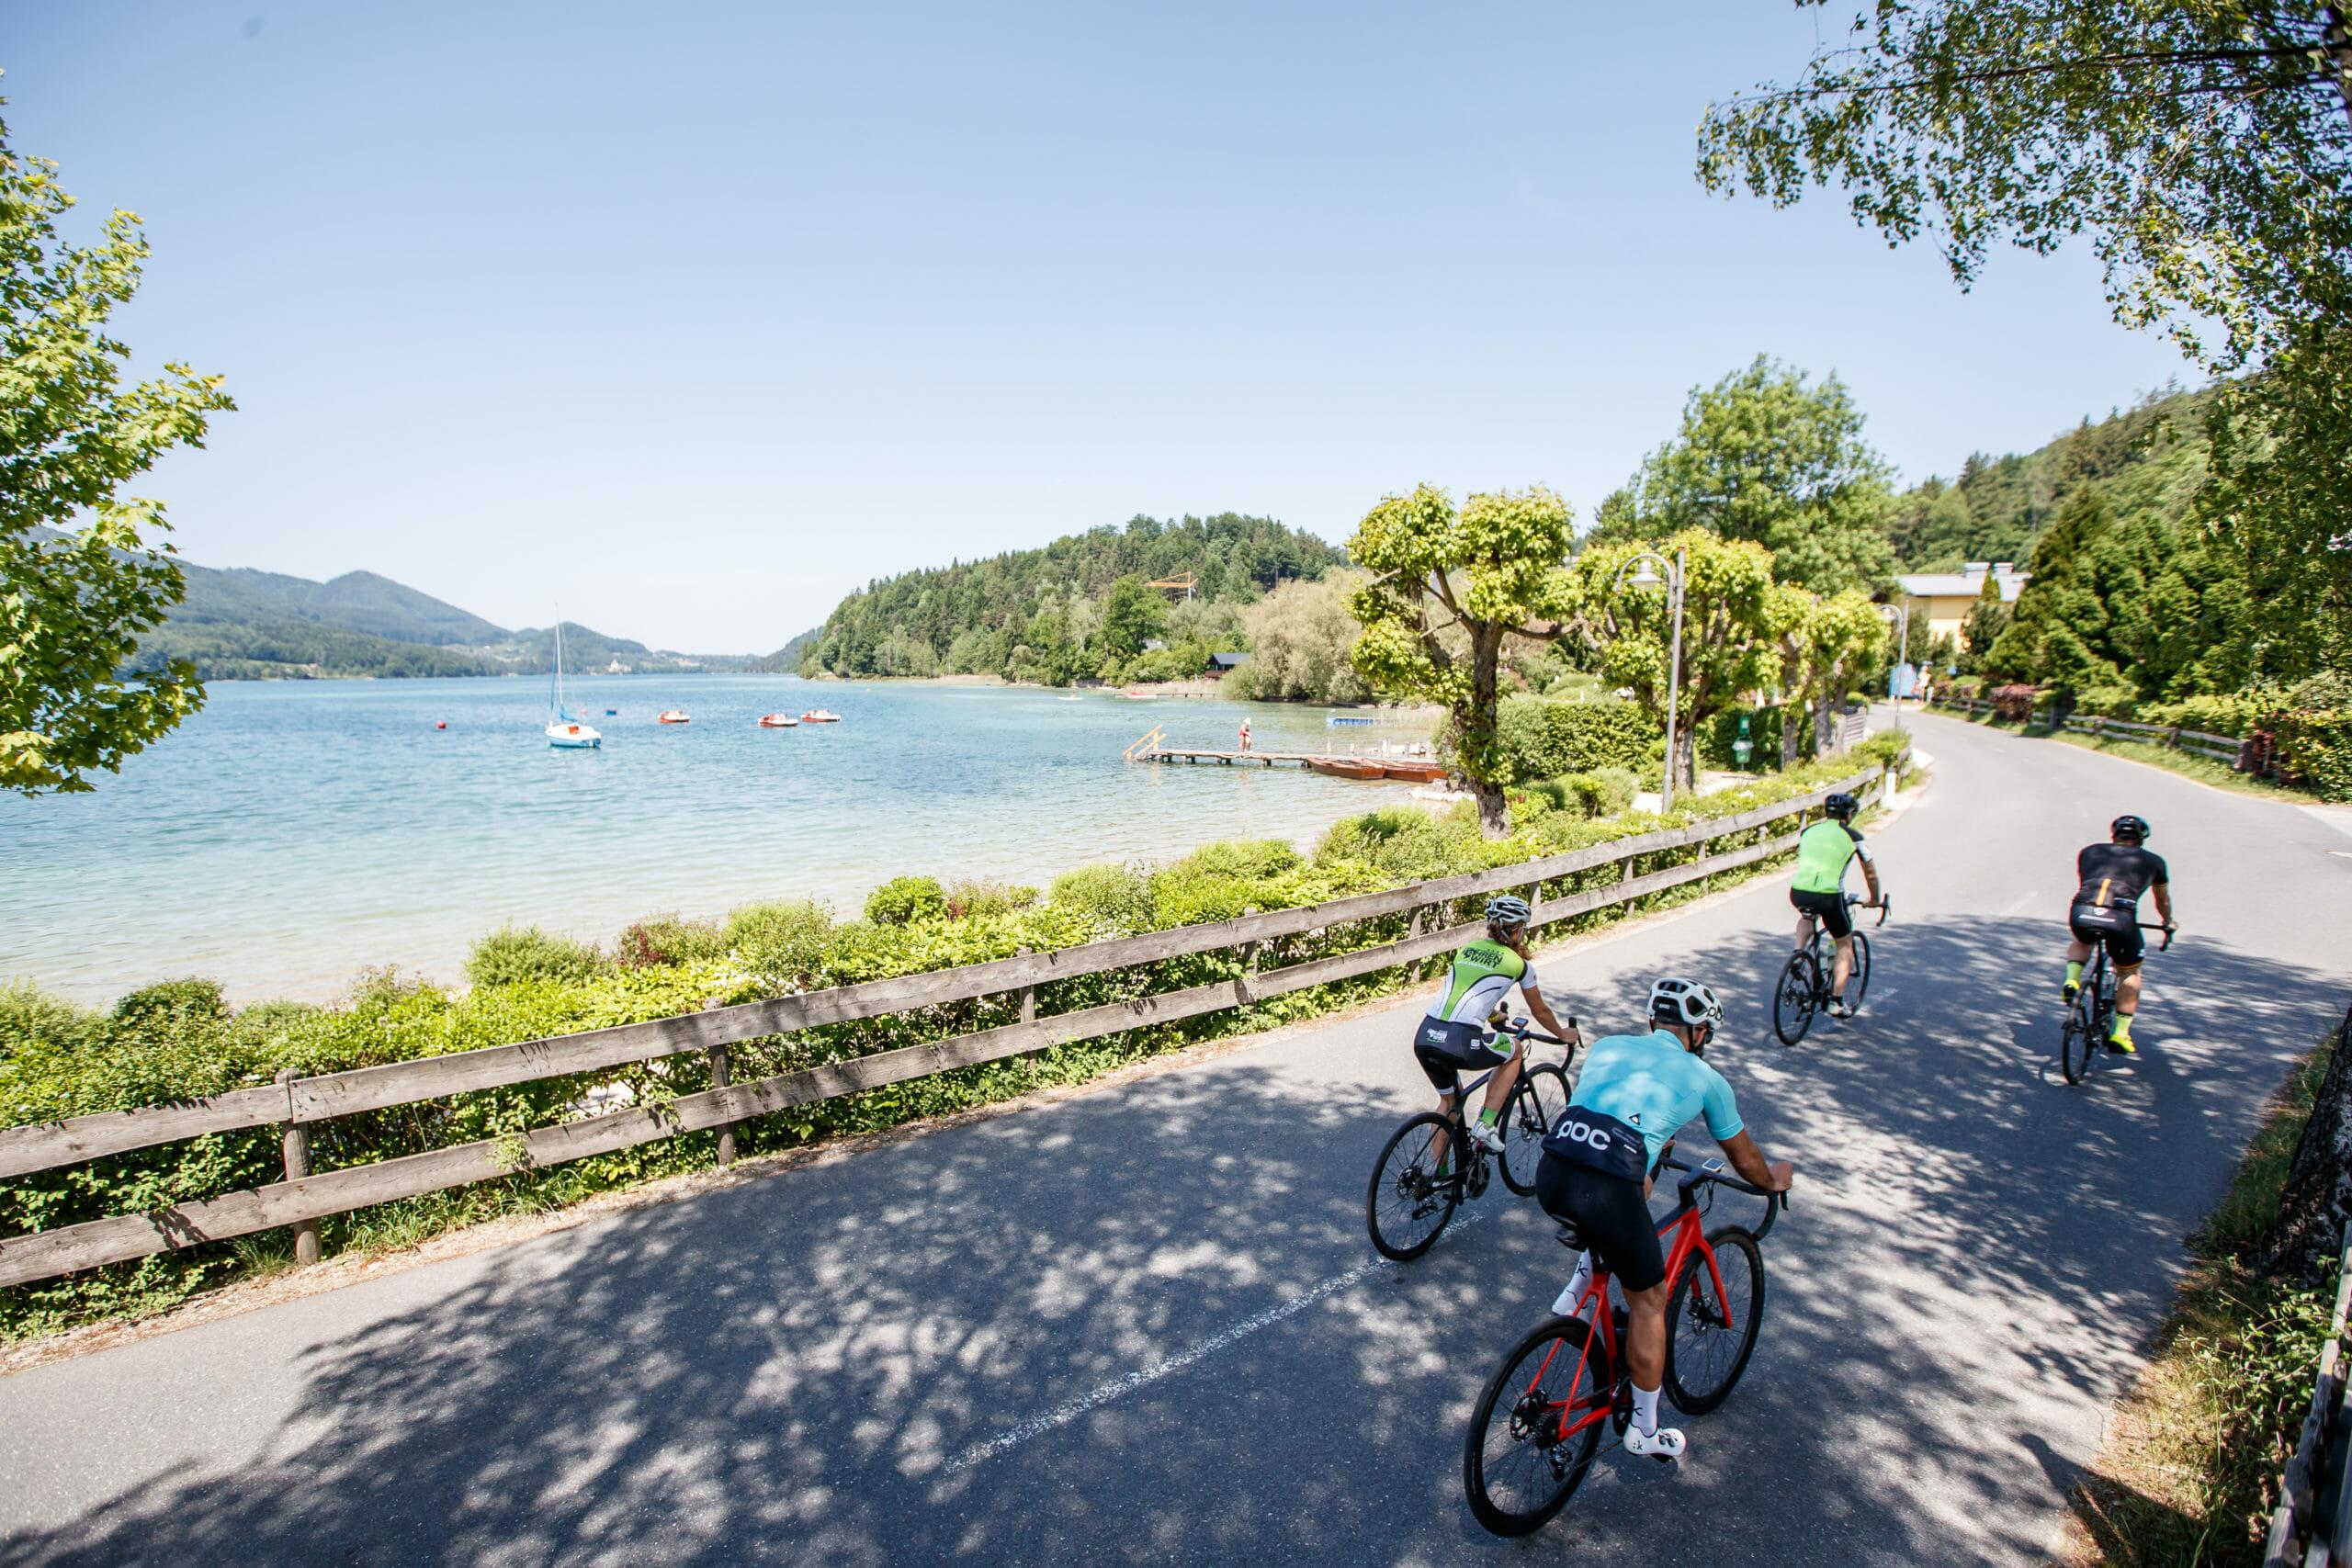 Mohrenwirt_Promenade_Copyright_Erwin_Haiden,bikeboard_0242